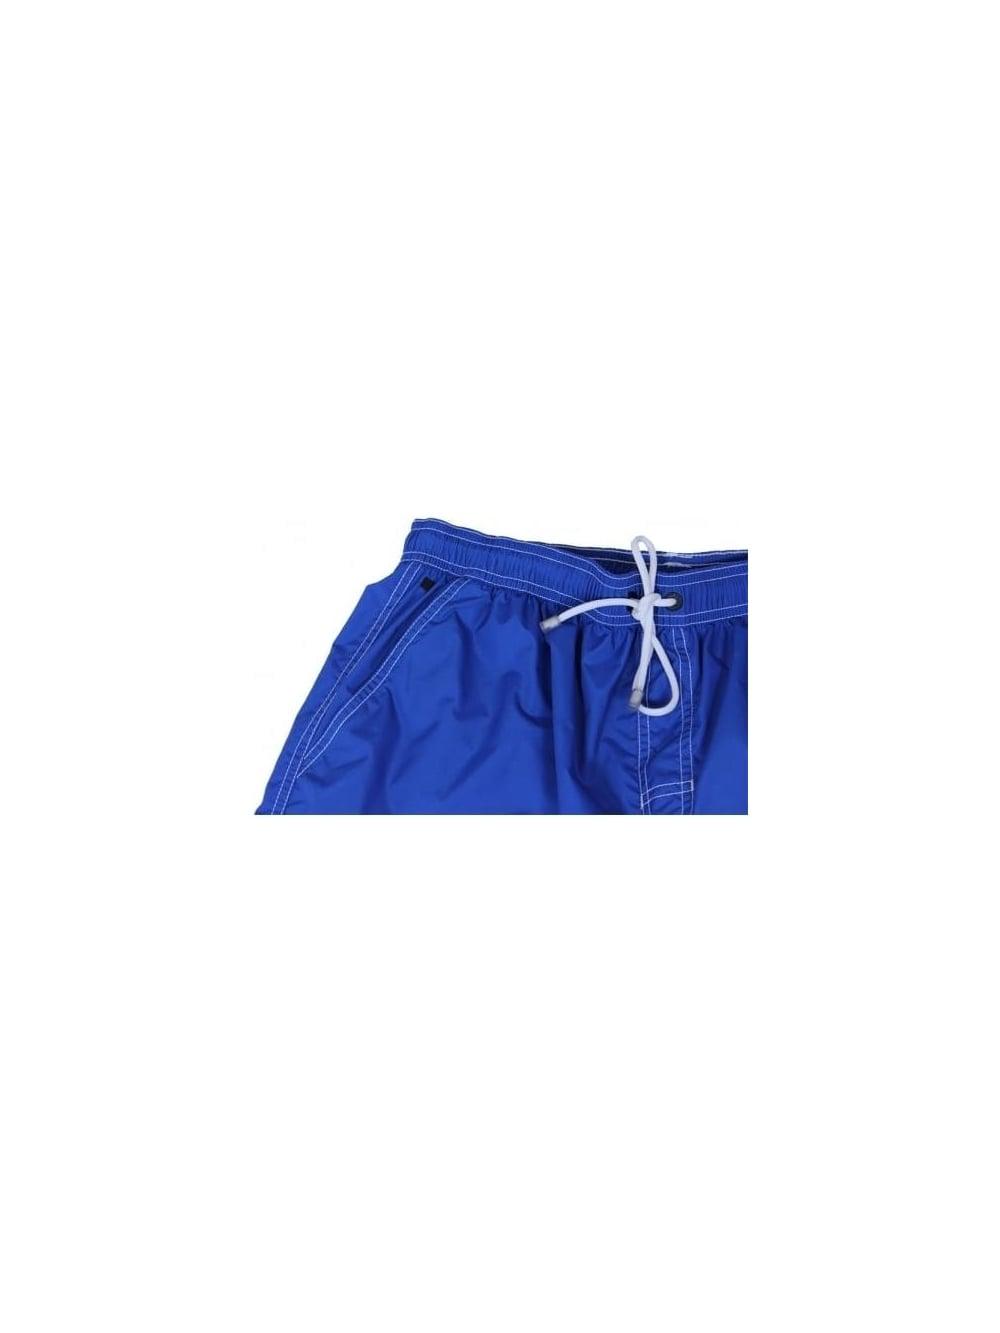 4770fbd68 Hugo Boss Black Lobster Swimming Shorts In Bright Blue - Northern ...